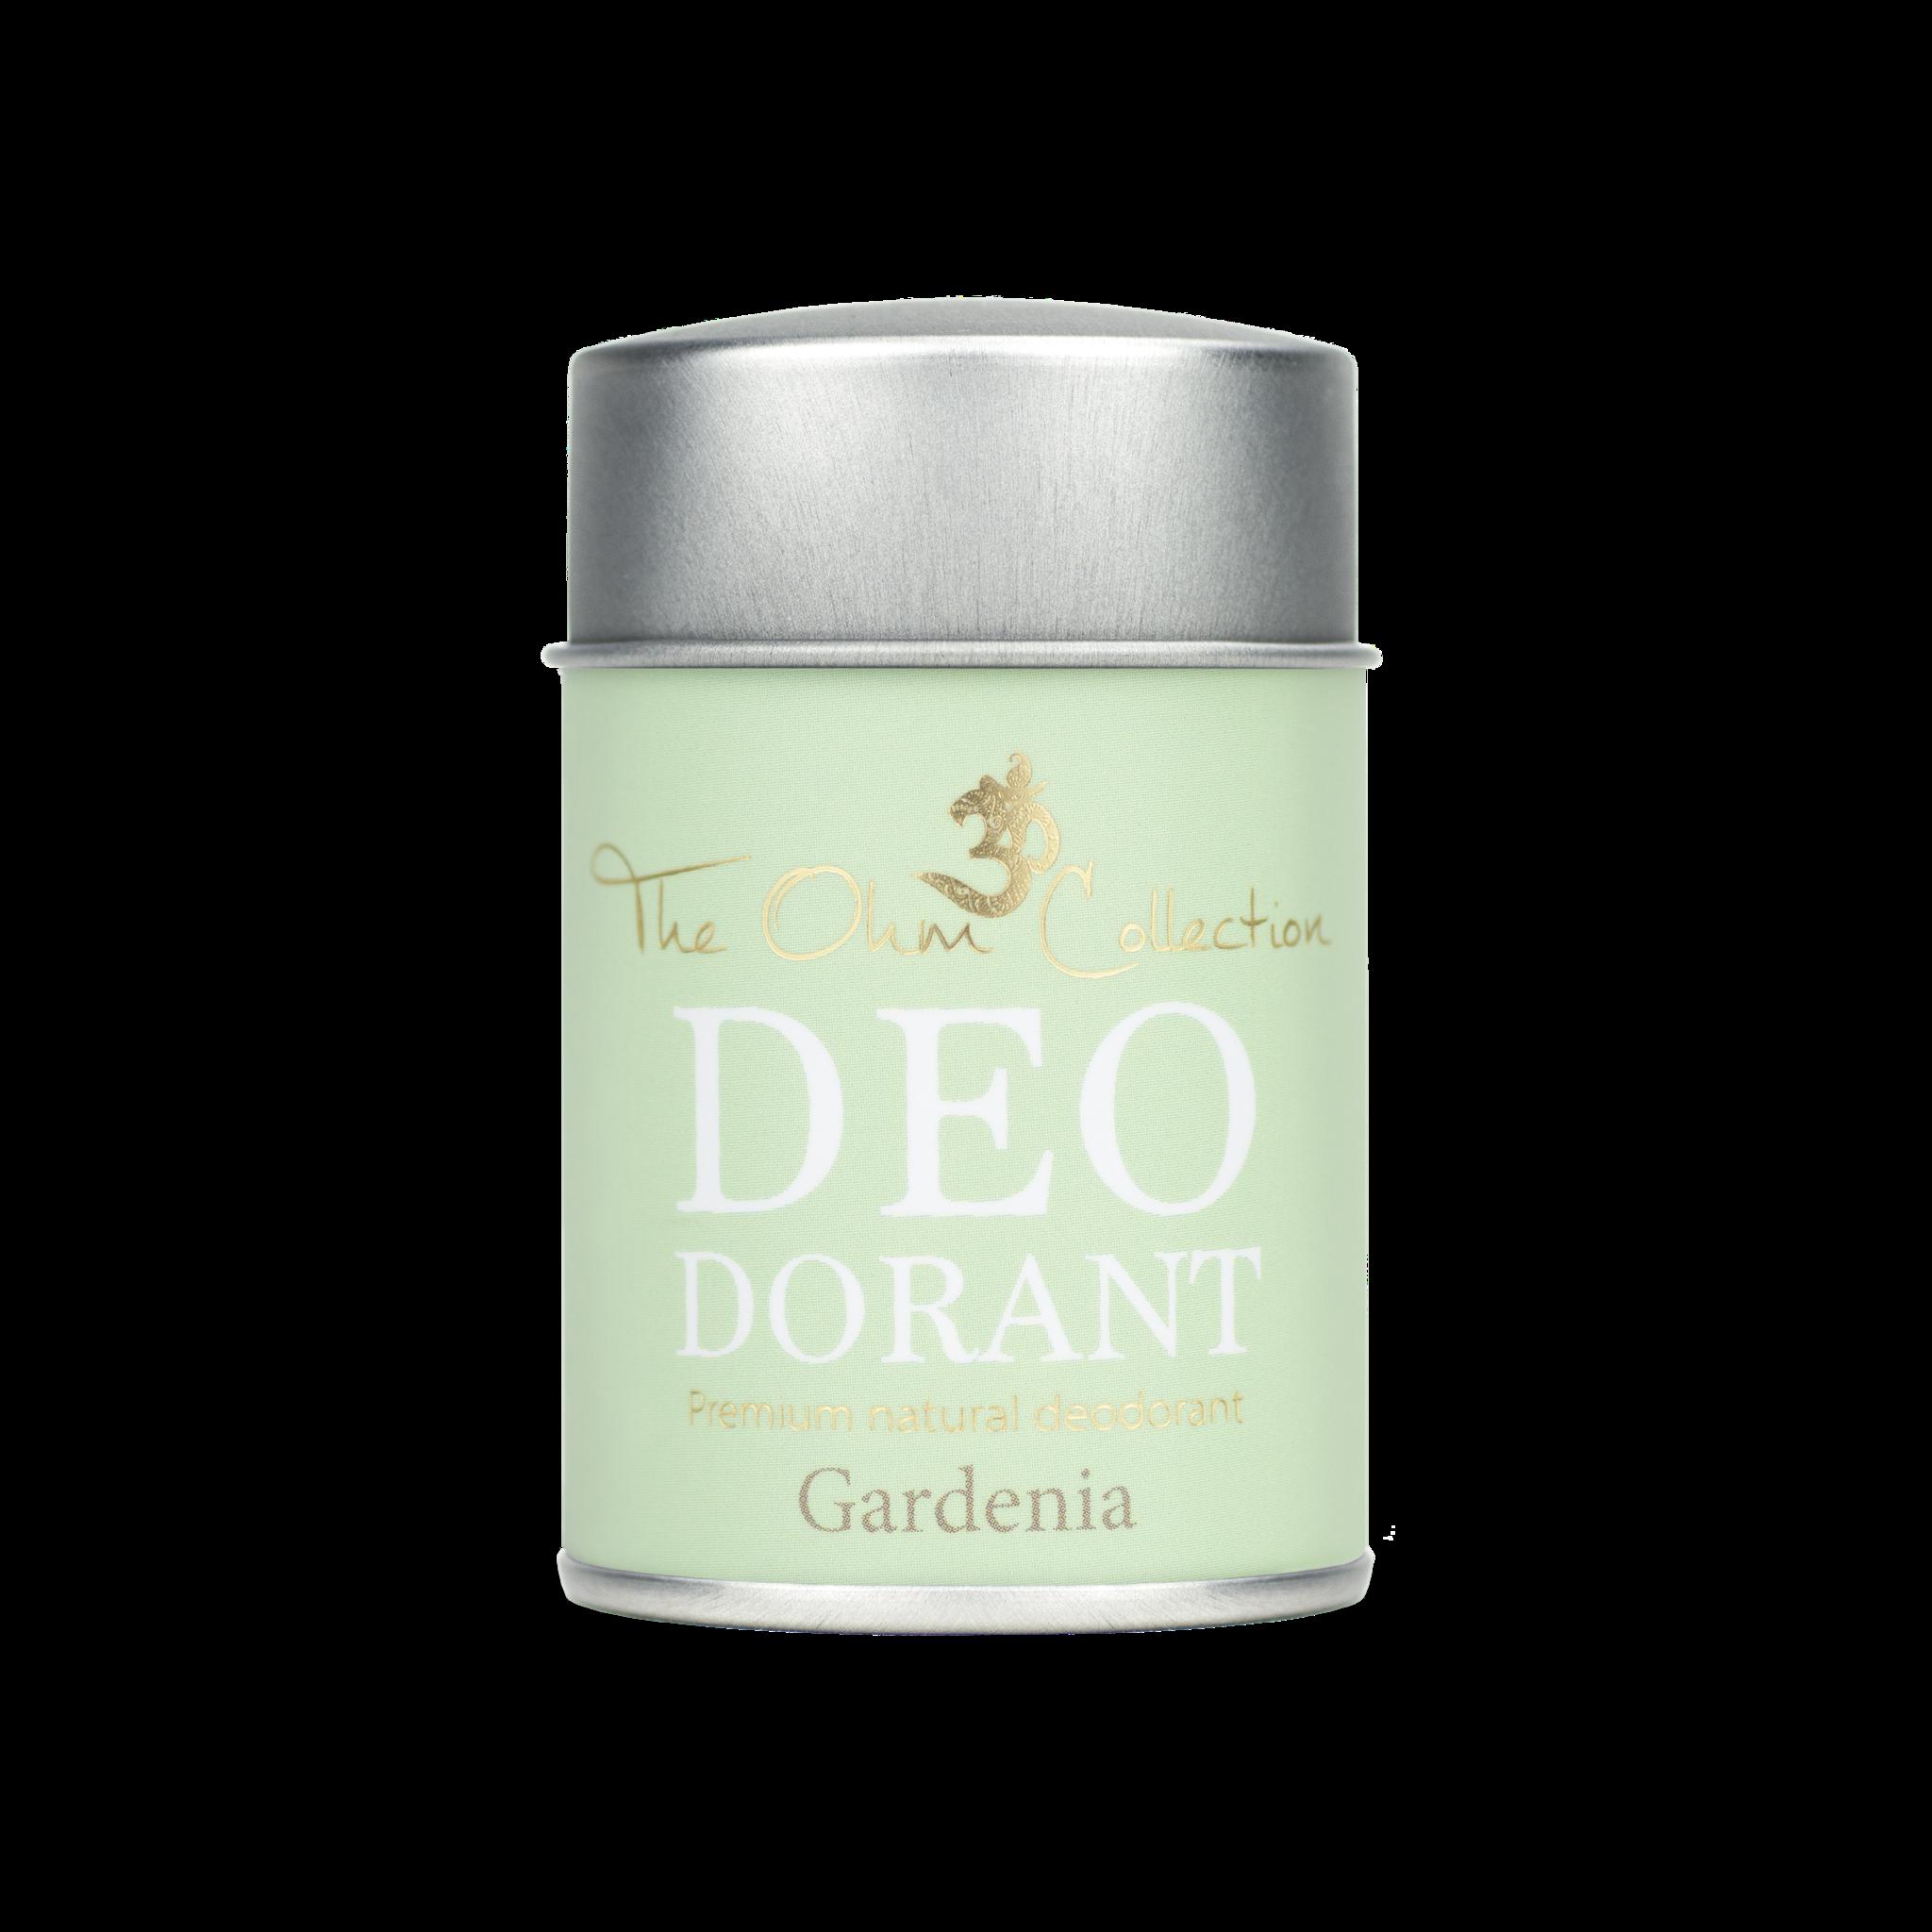 The Ohm Collection DEO Dorant Gardenia 50 gr